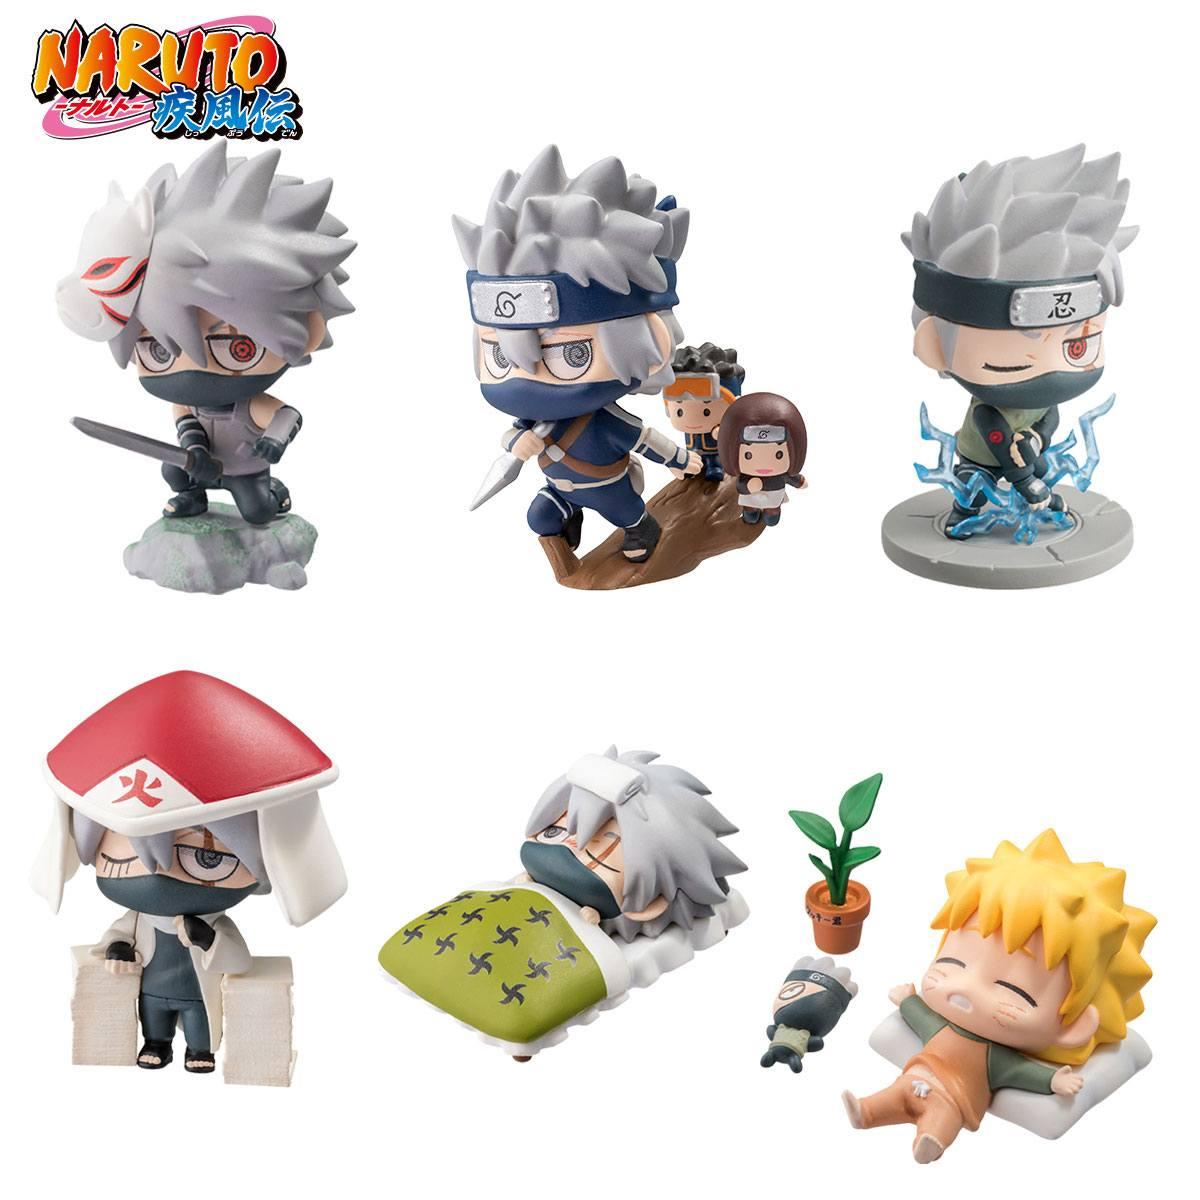 Naruto Shippuden Petit Chara Land Trading Figure 6-Pack Kakashi Special Set 5 cm